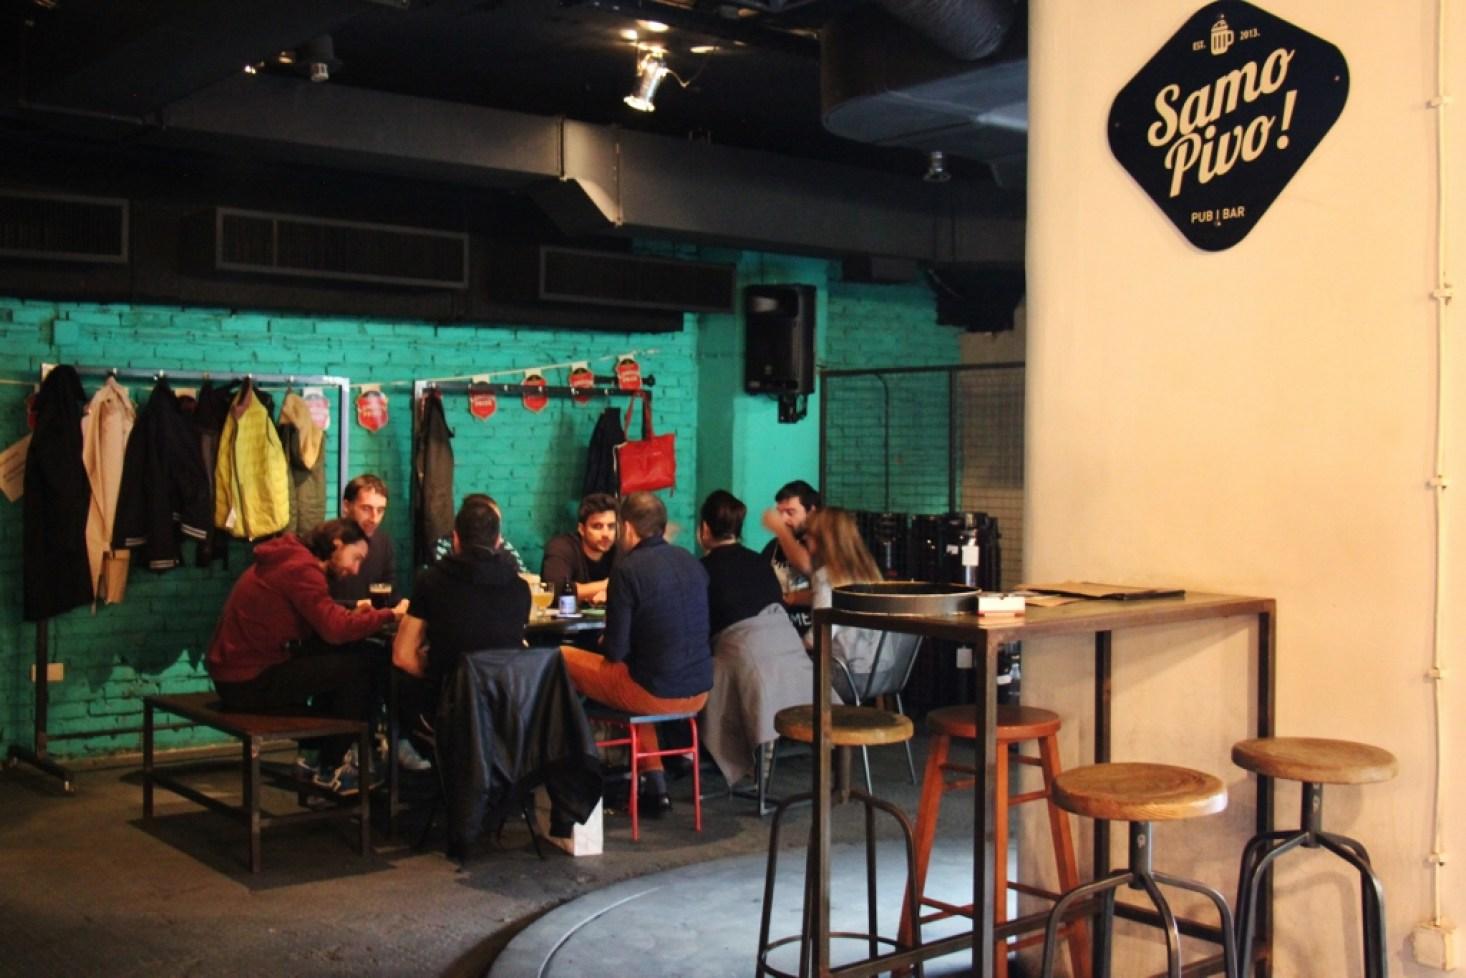 Patrons at Samo Pivo craft beer bar in Belgrade, Serbia